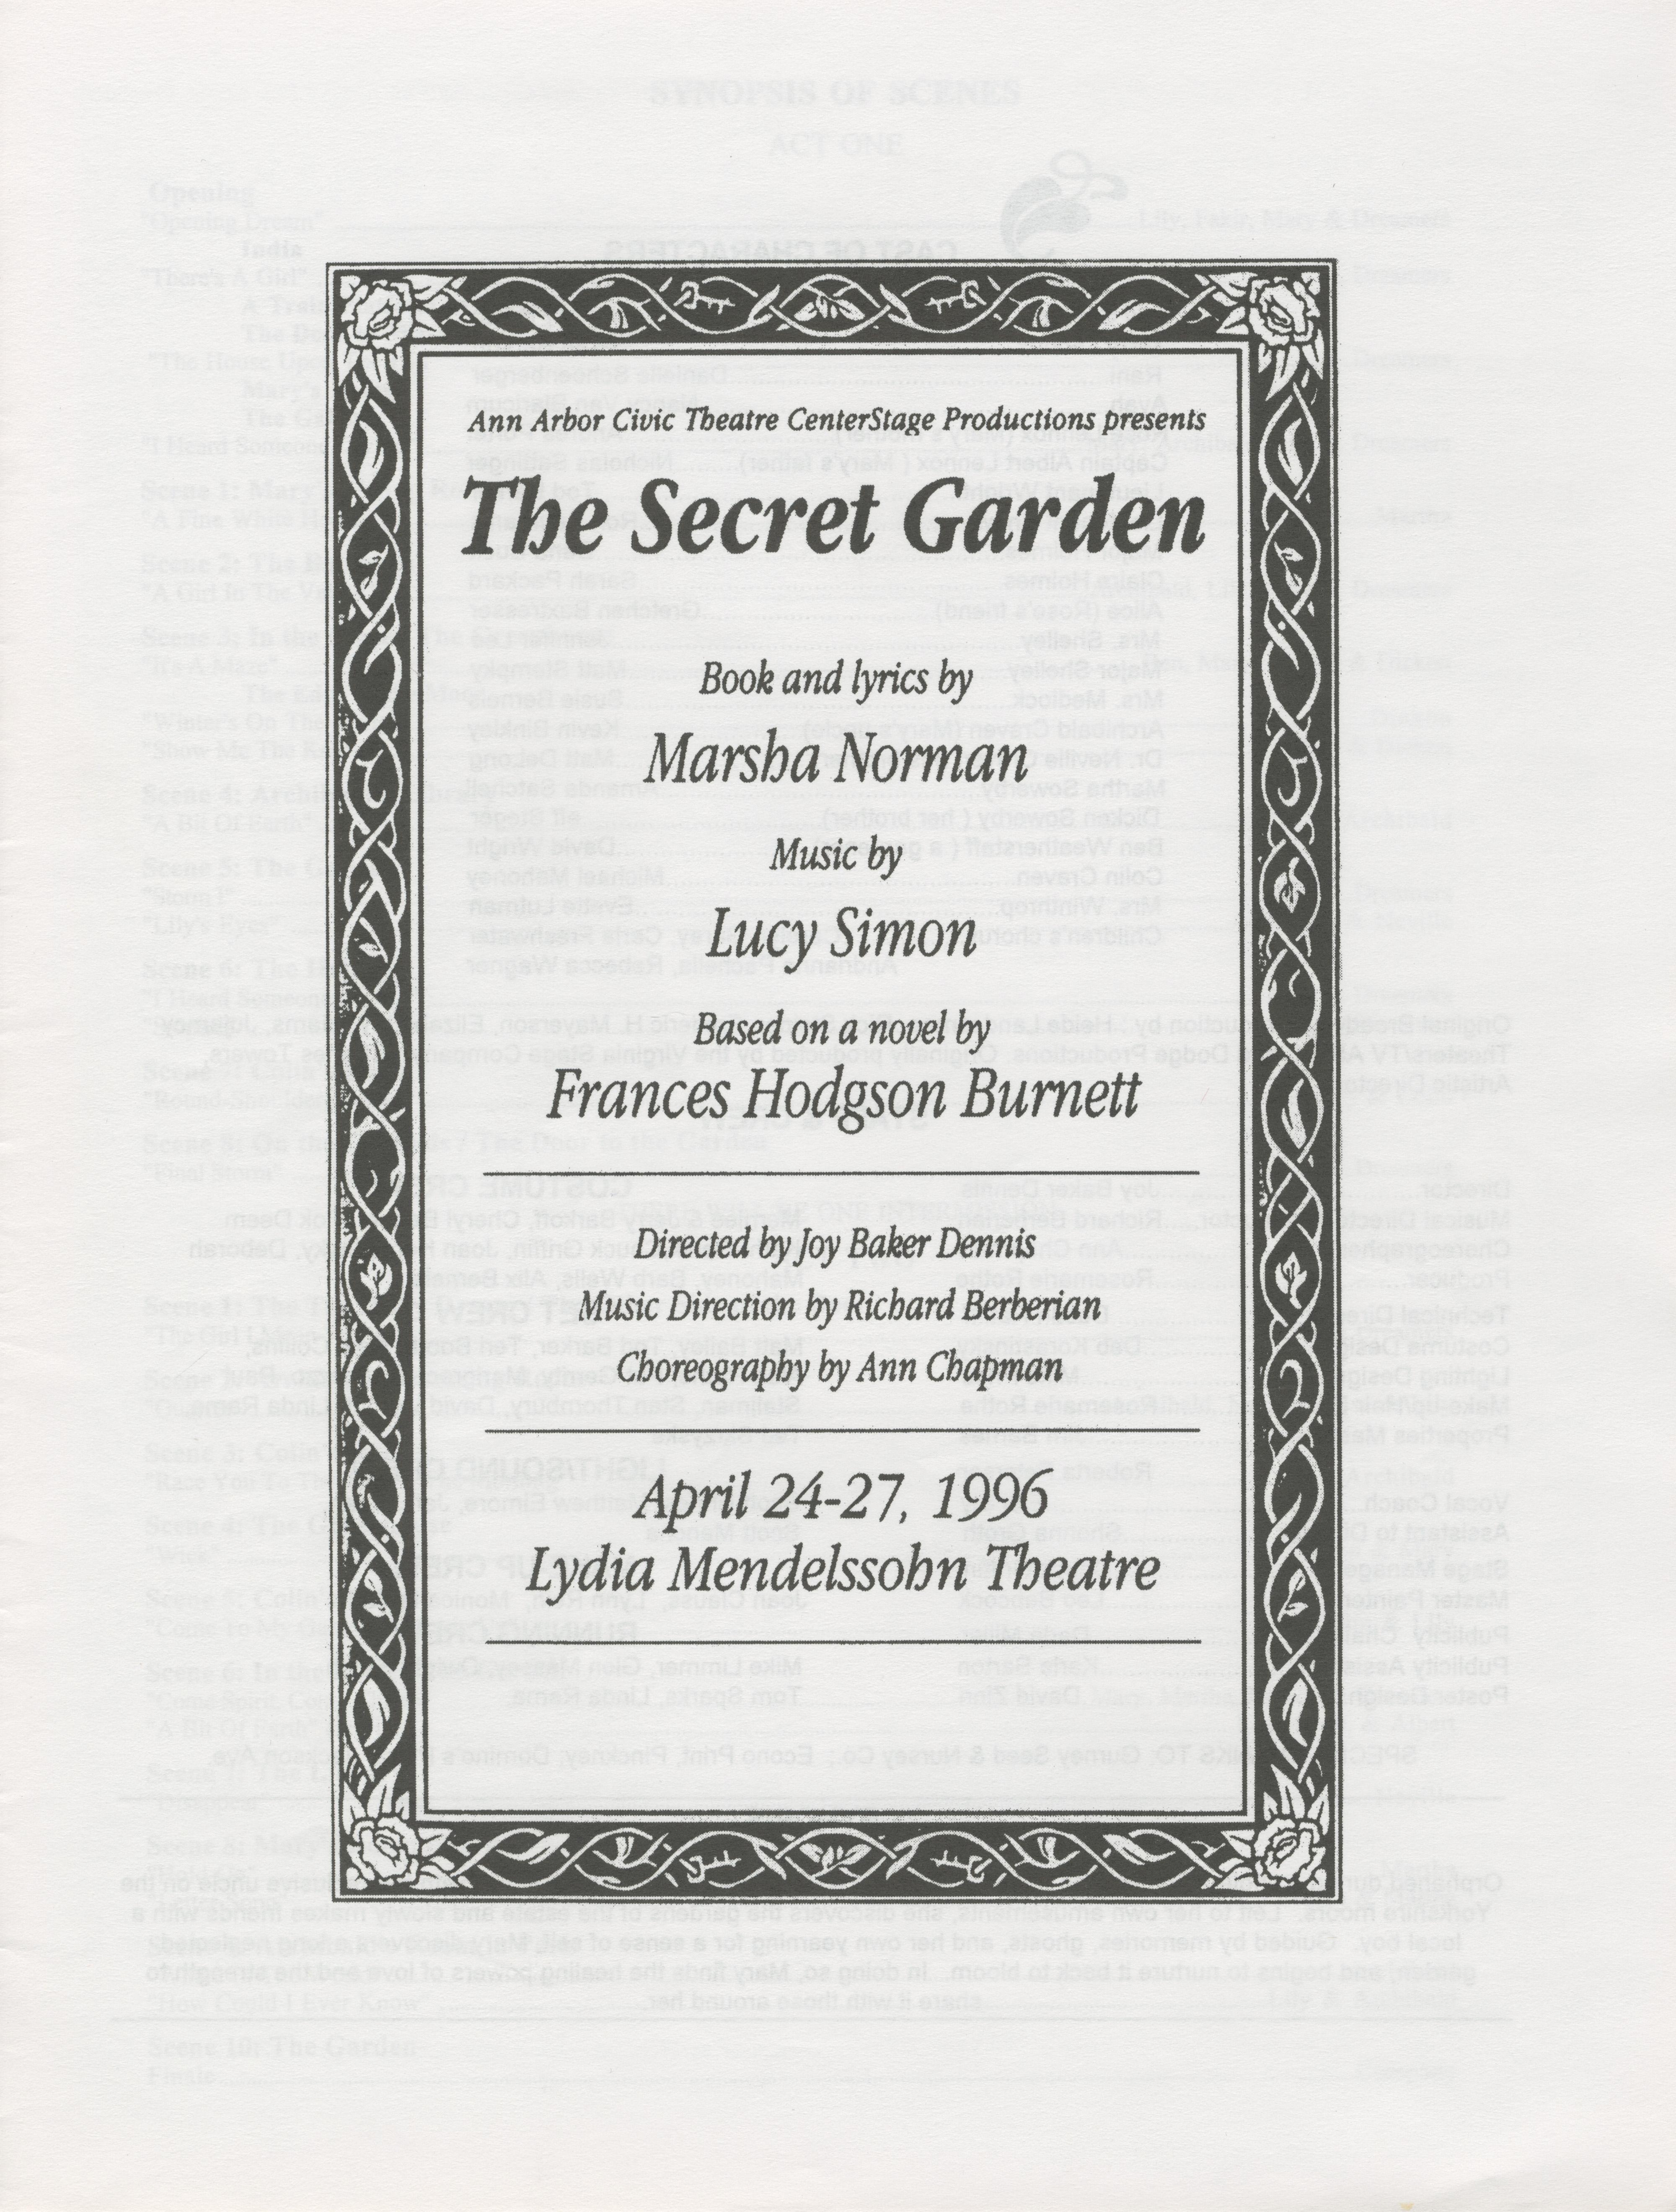 Ann arbor civic theatre program the secret garden april 24 1996 ann arbor civic theatre program the secret garden april 24 1996 stopboris Gallery